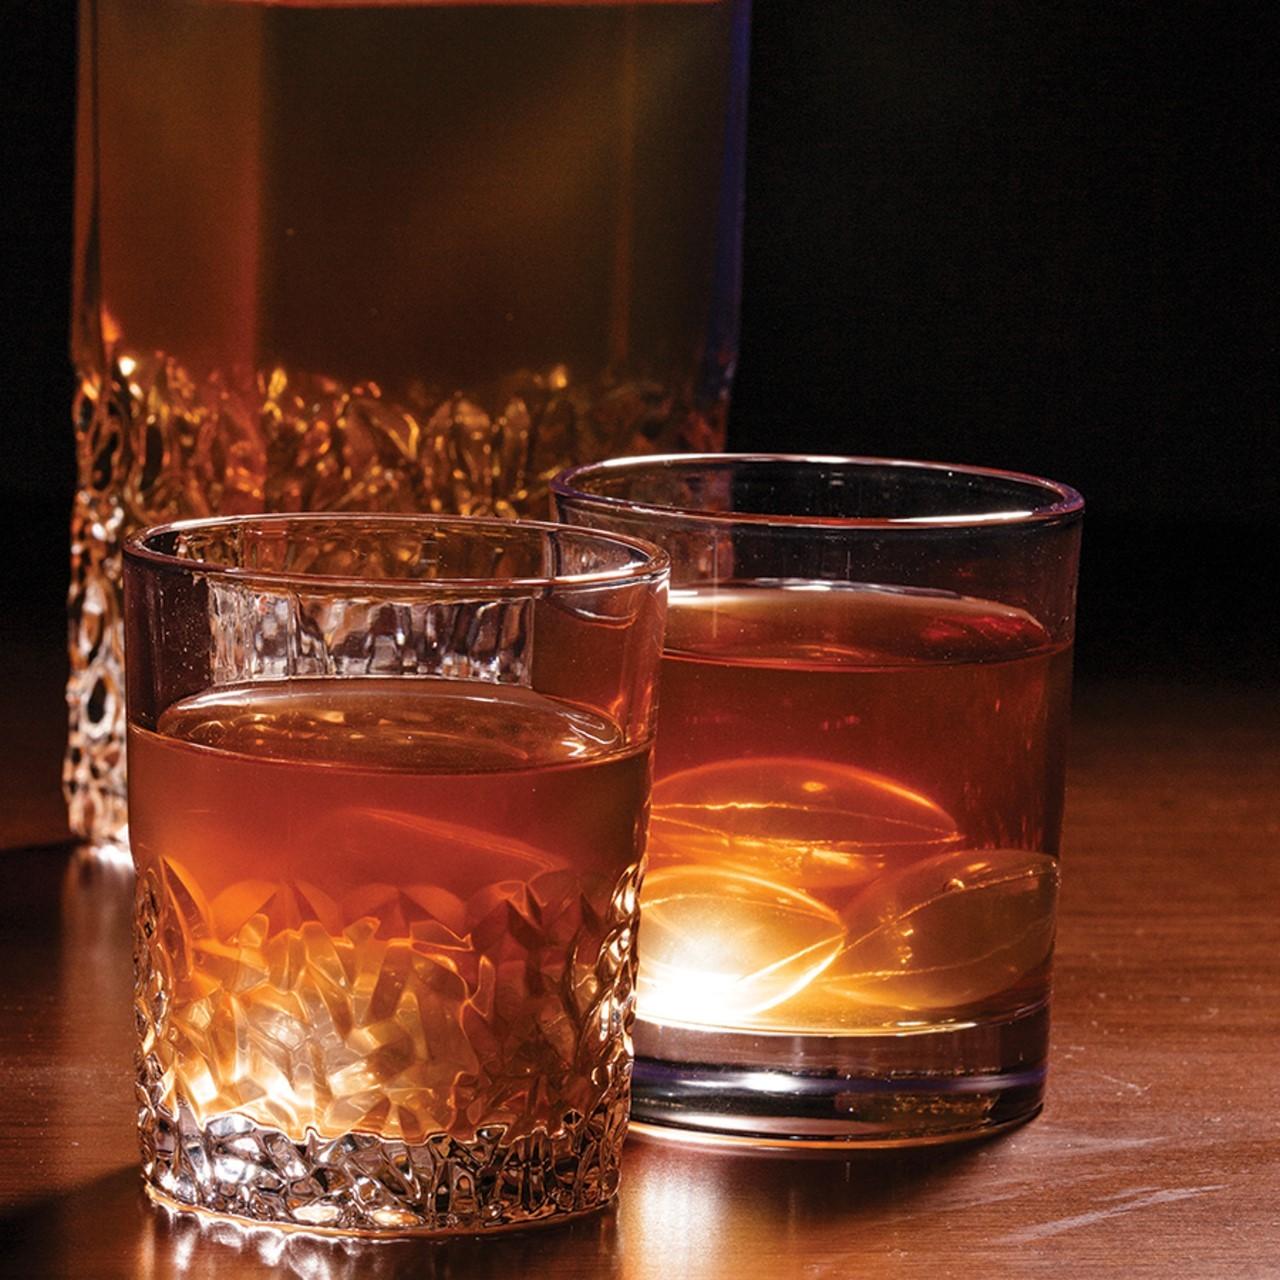 Jogo 6 copos 350ml para whisky de cristal de chumbo Wolff 27780